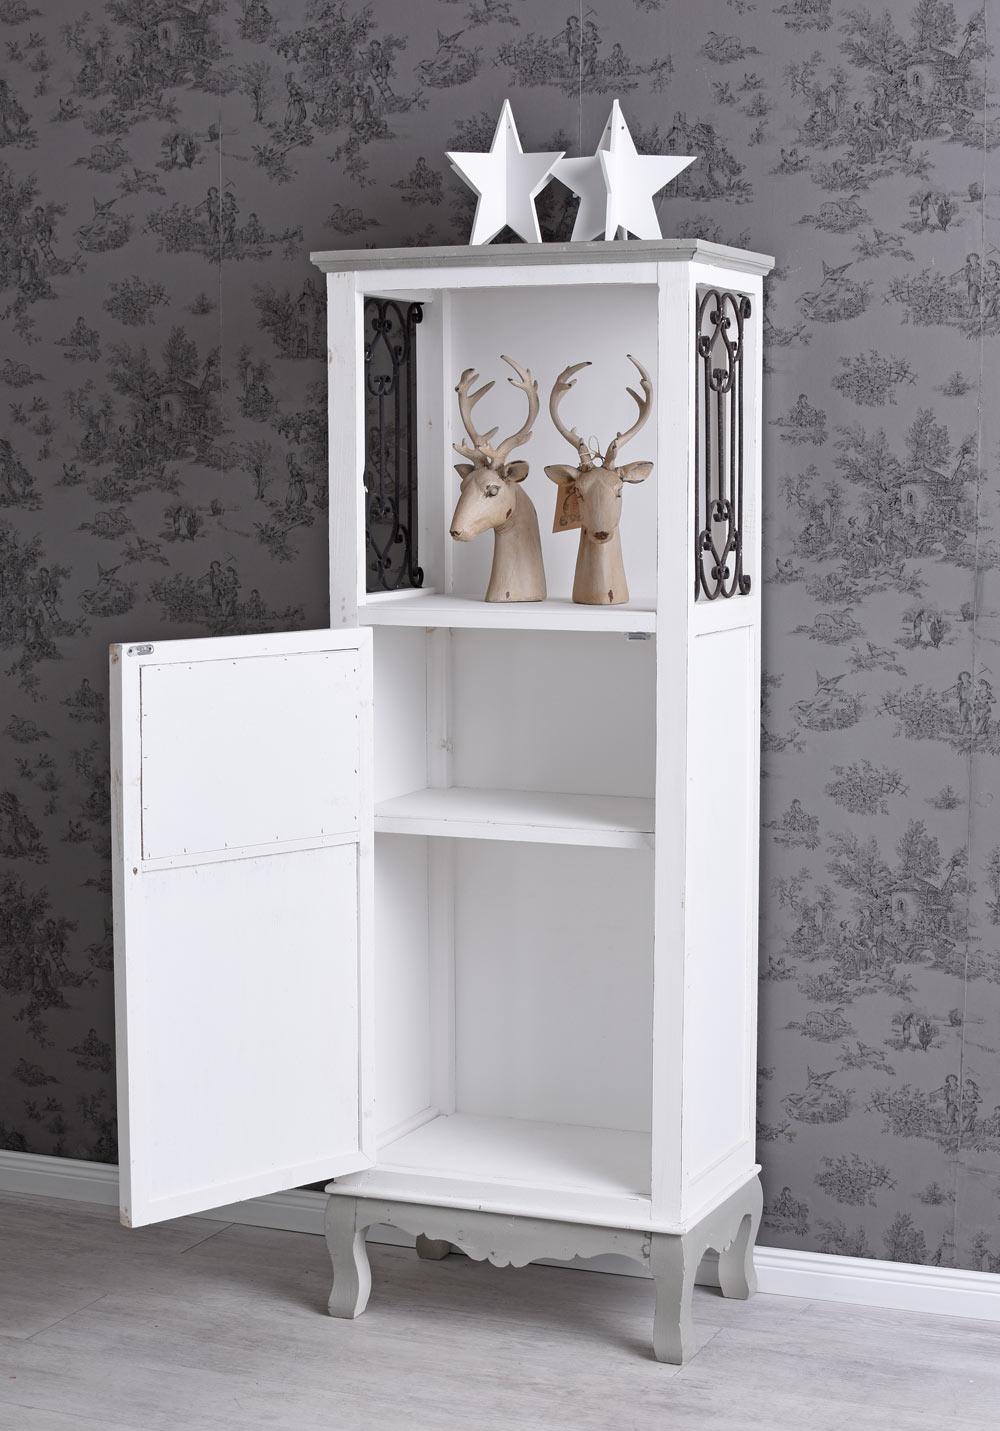 garderobenschrank holzschrank holzregal shabby chic badregal badezimmerschrank ebay. Black Bedroom Furniture Sets. Home Design Ideas